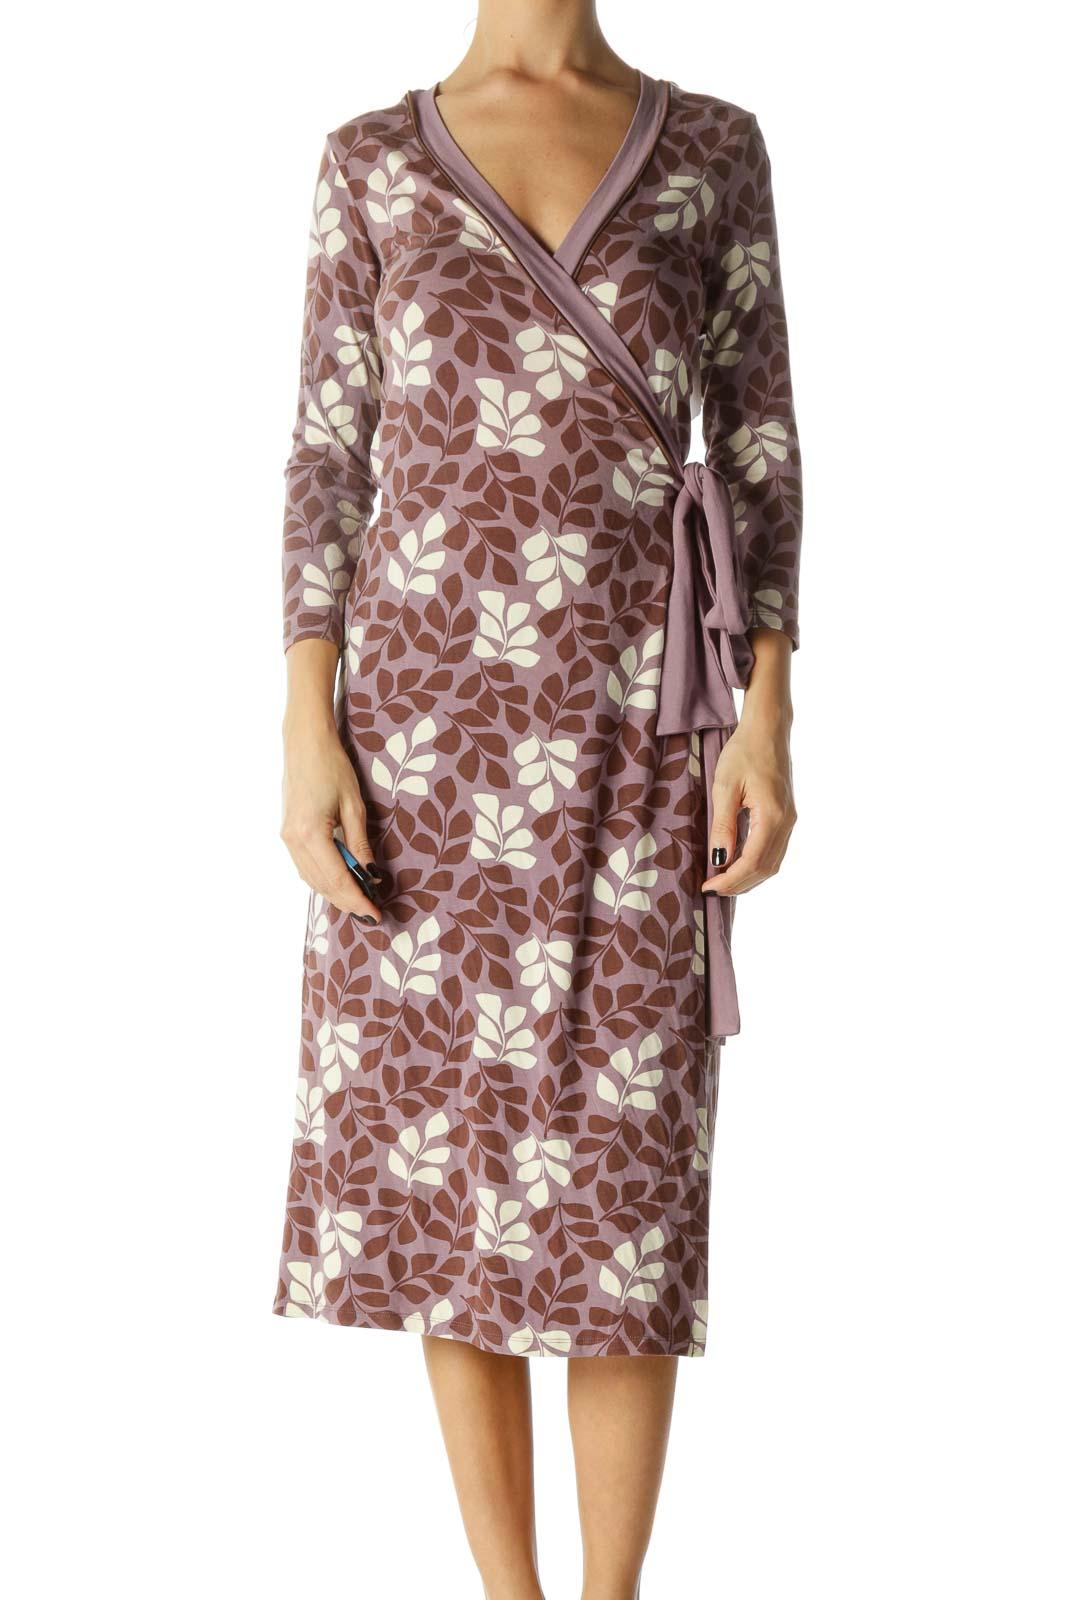 Purple, Beige and Brown Floral Print Knee Length Wrap Dress